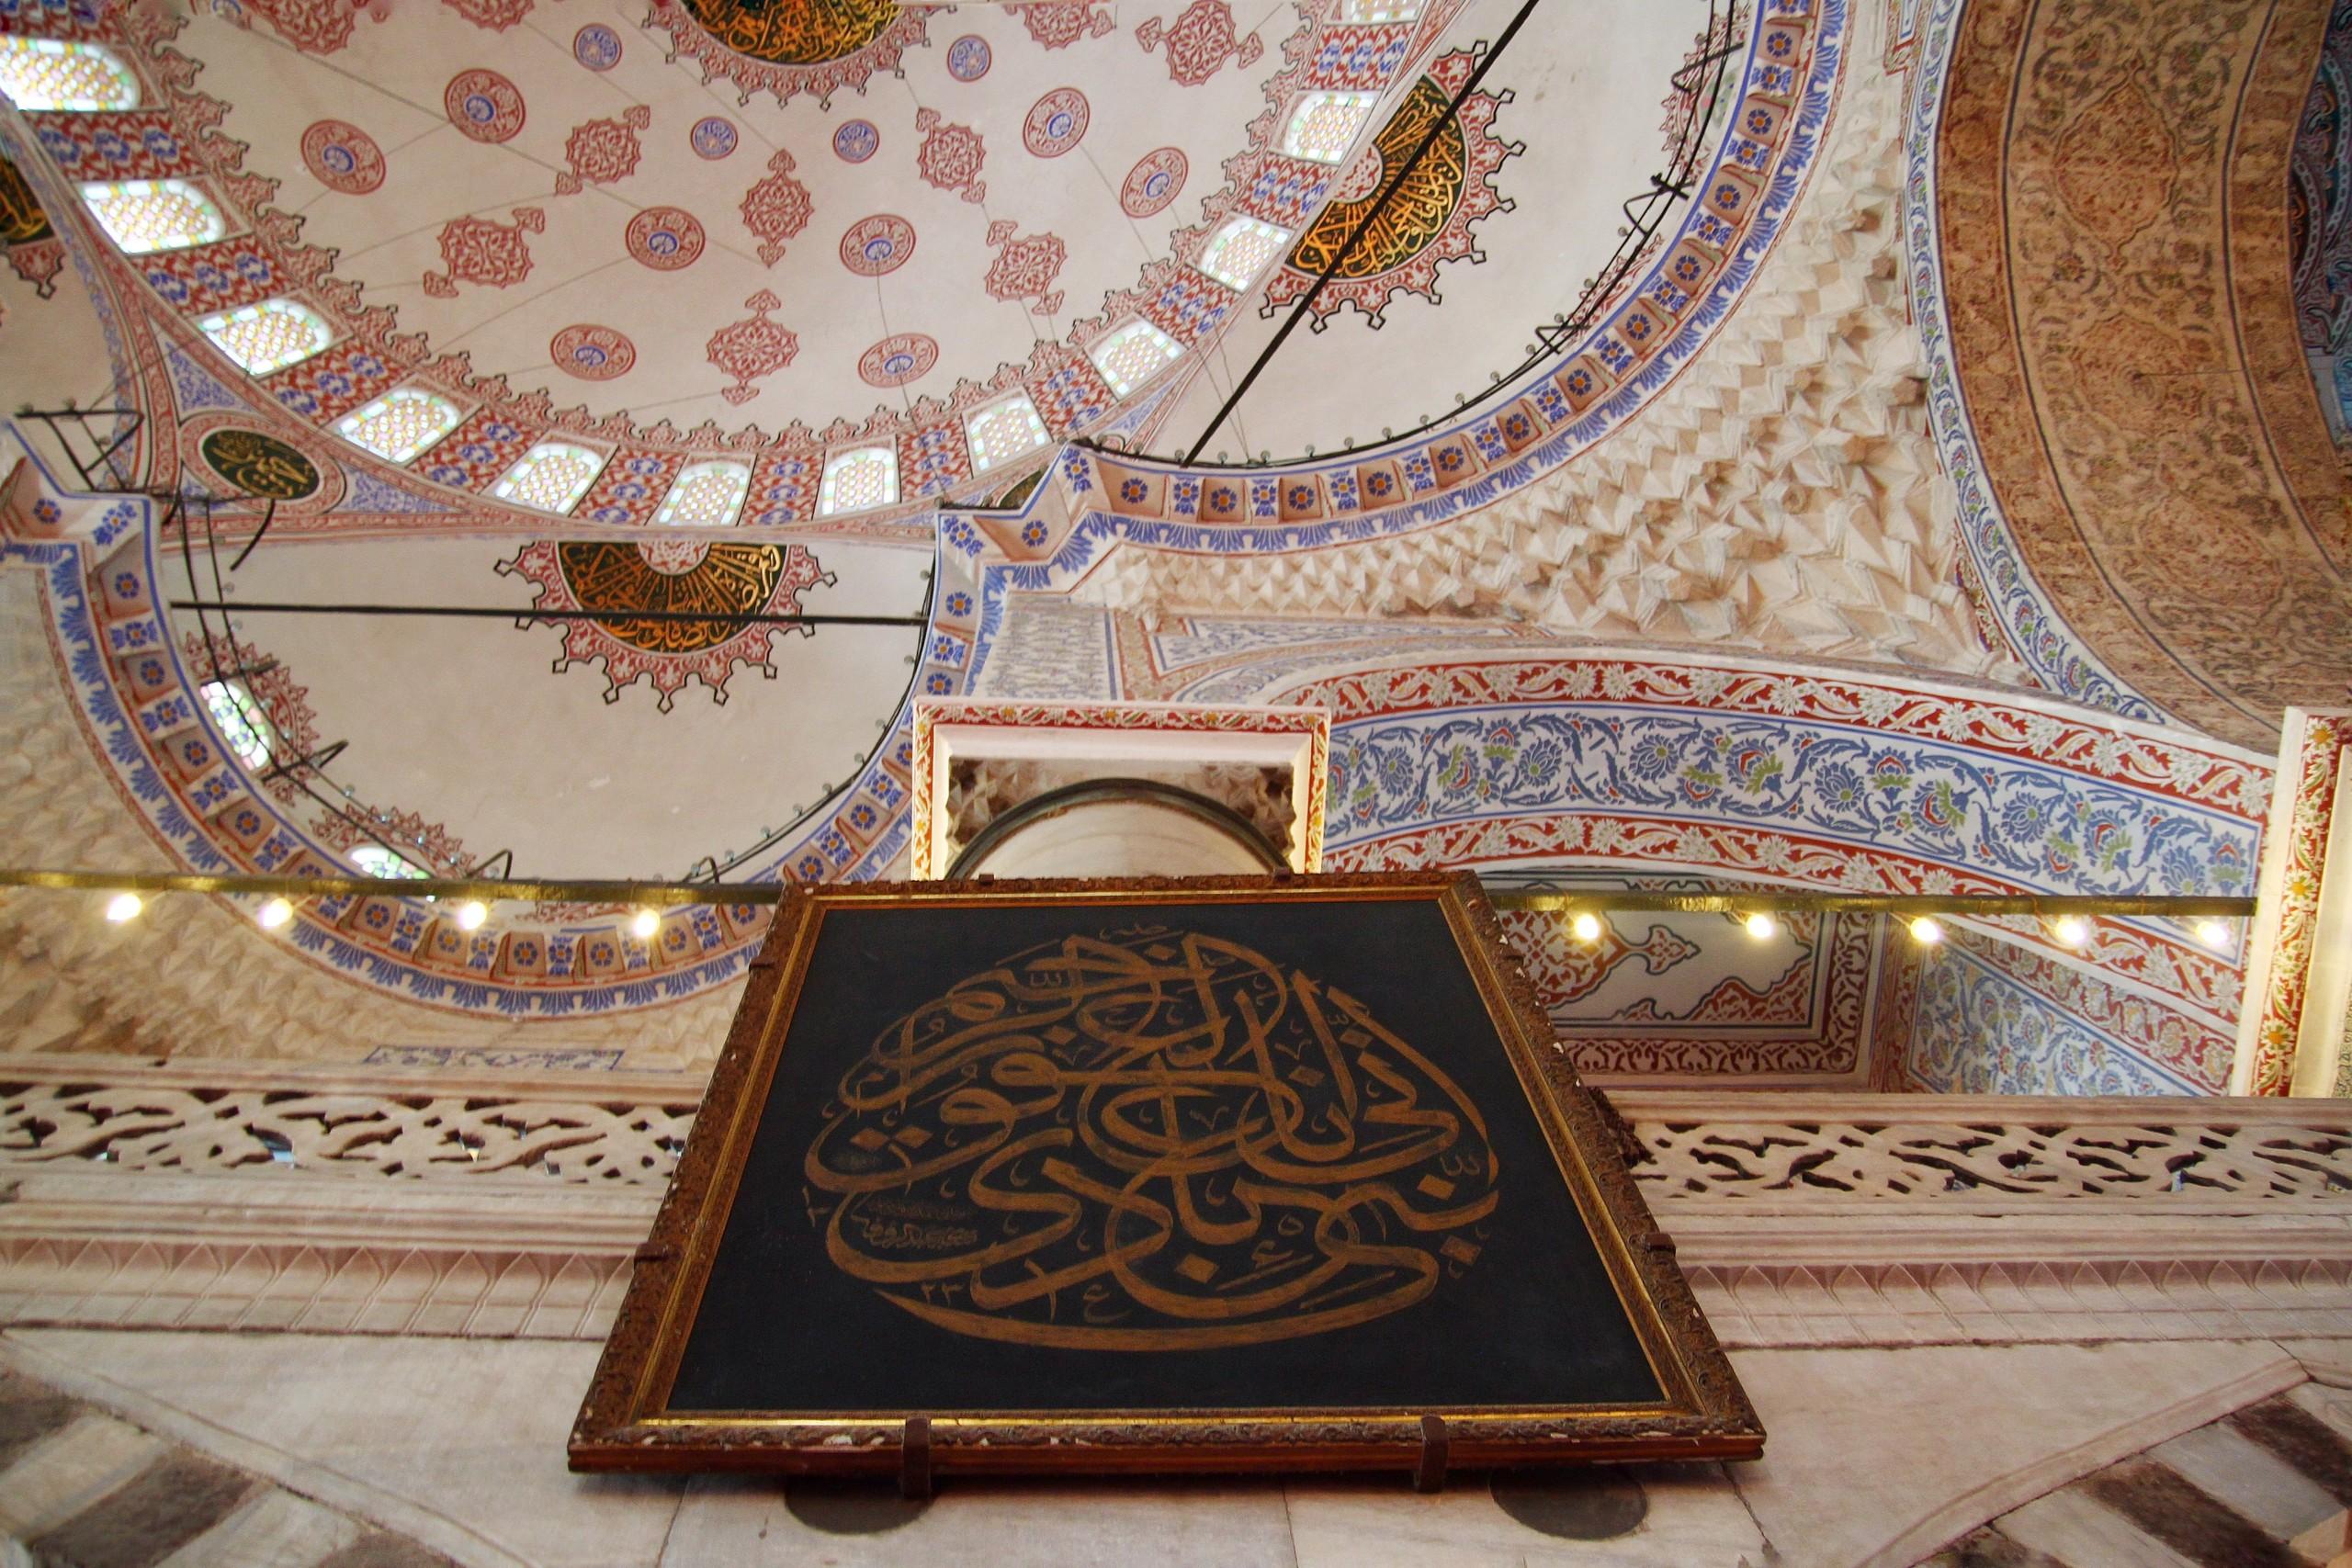 Pırlantadan Kubbeler #5: Sultanahmed - 5VEj55 - Pırlantadan Kubbeler #5: Sultanahmed